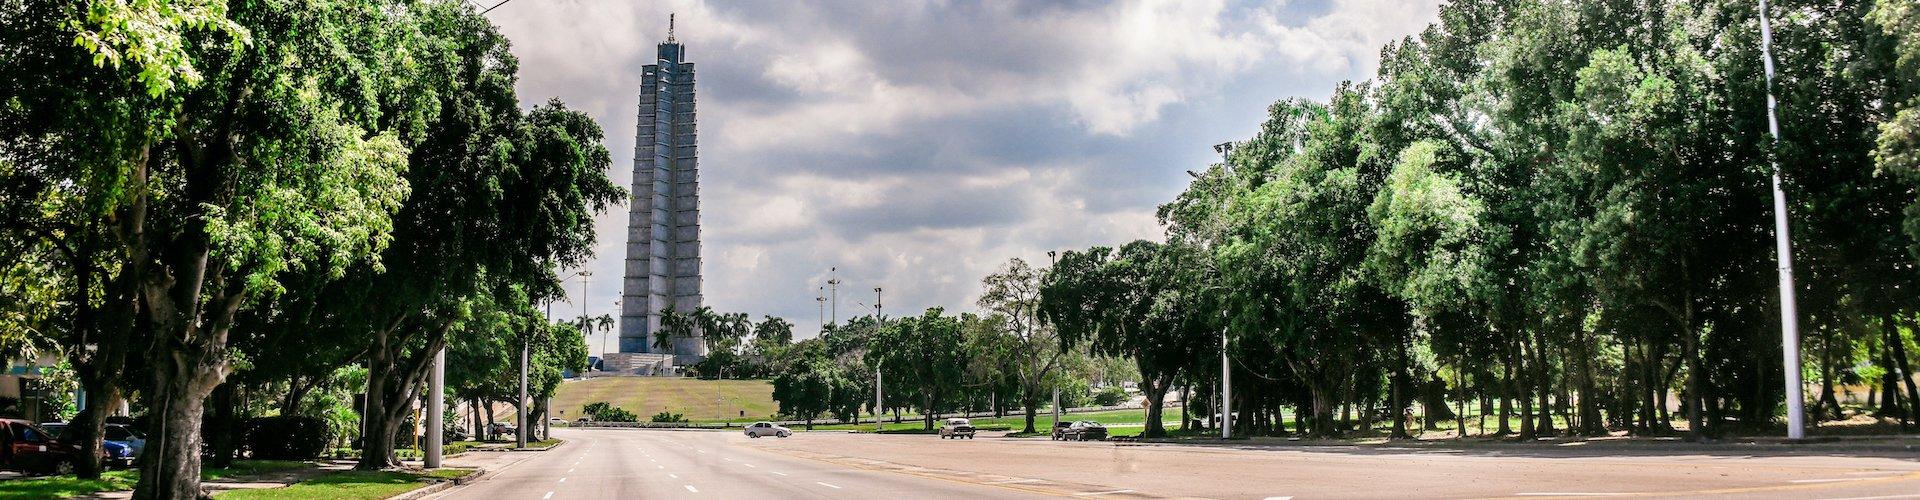 Ausflugsziel Plaza de la Revolución